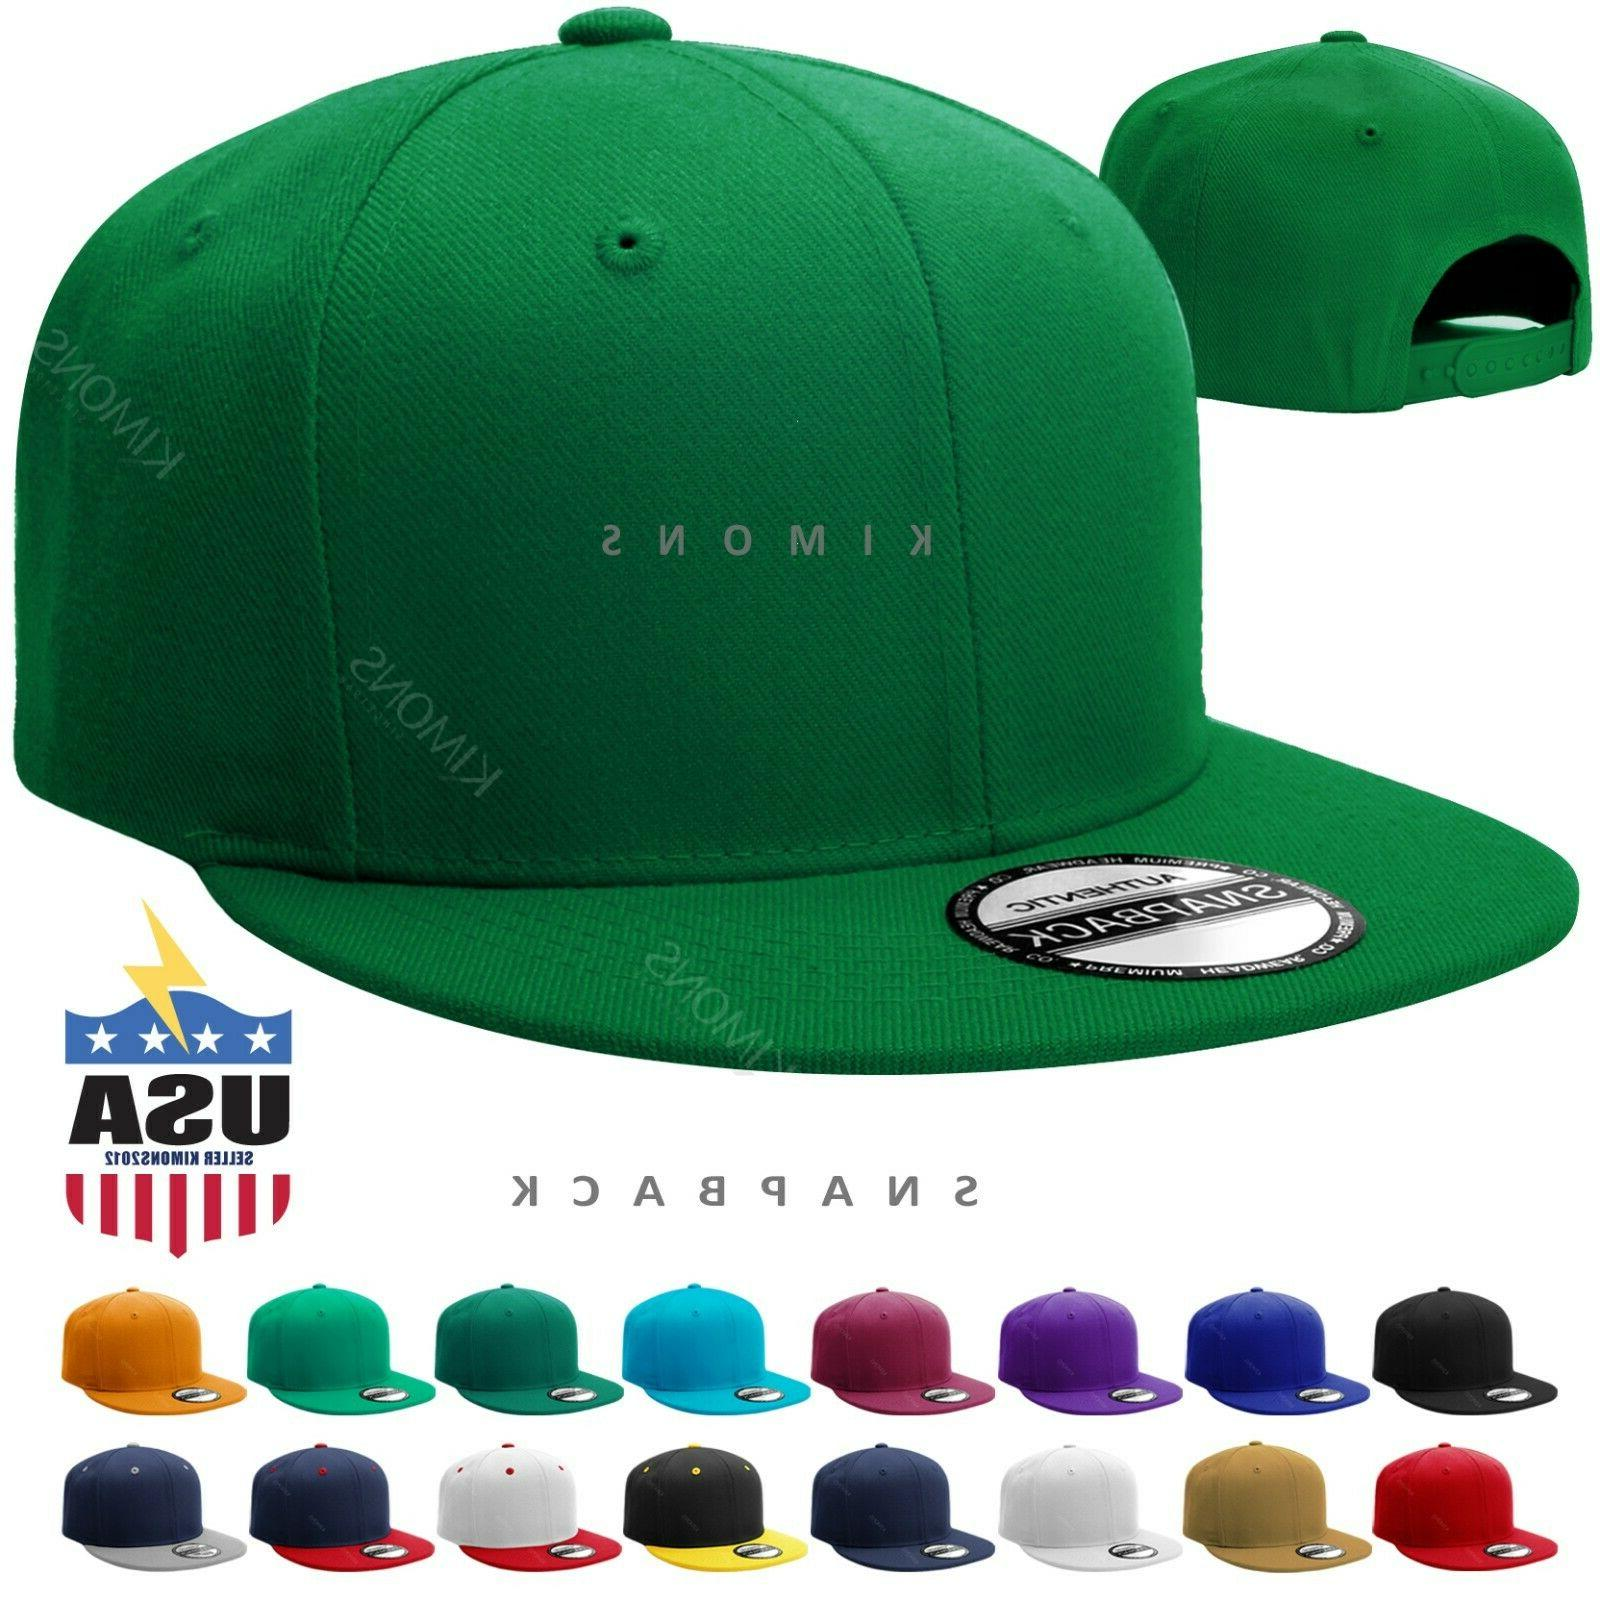 snapback hat classic hip hop style flat